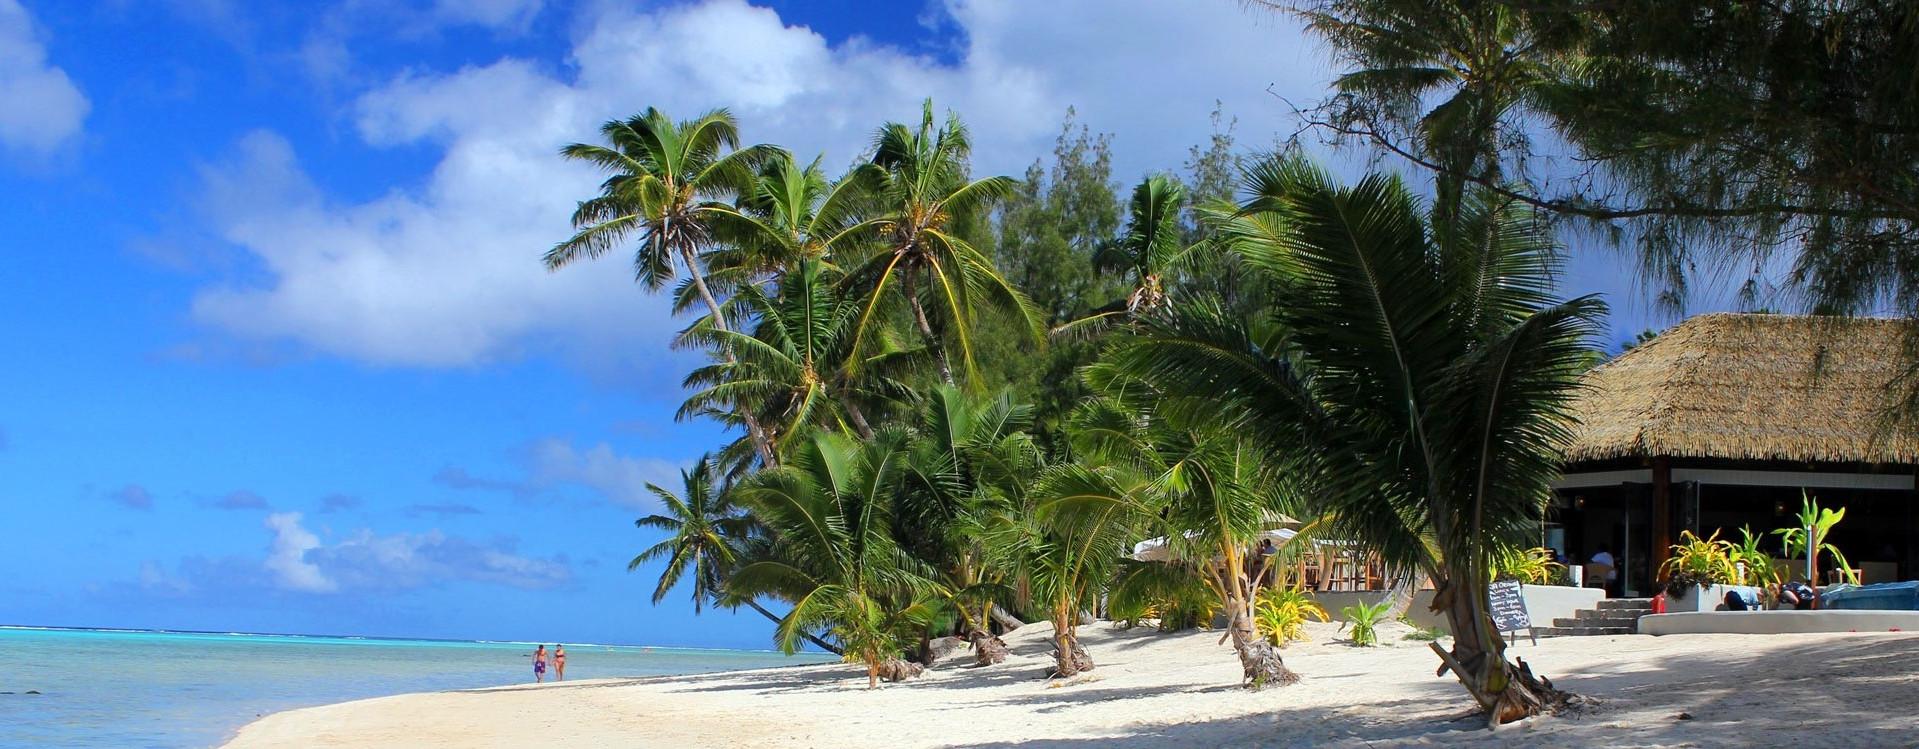 Beautiful Island Beach DTC4F